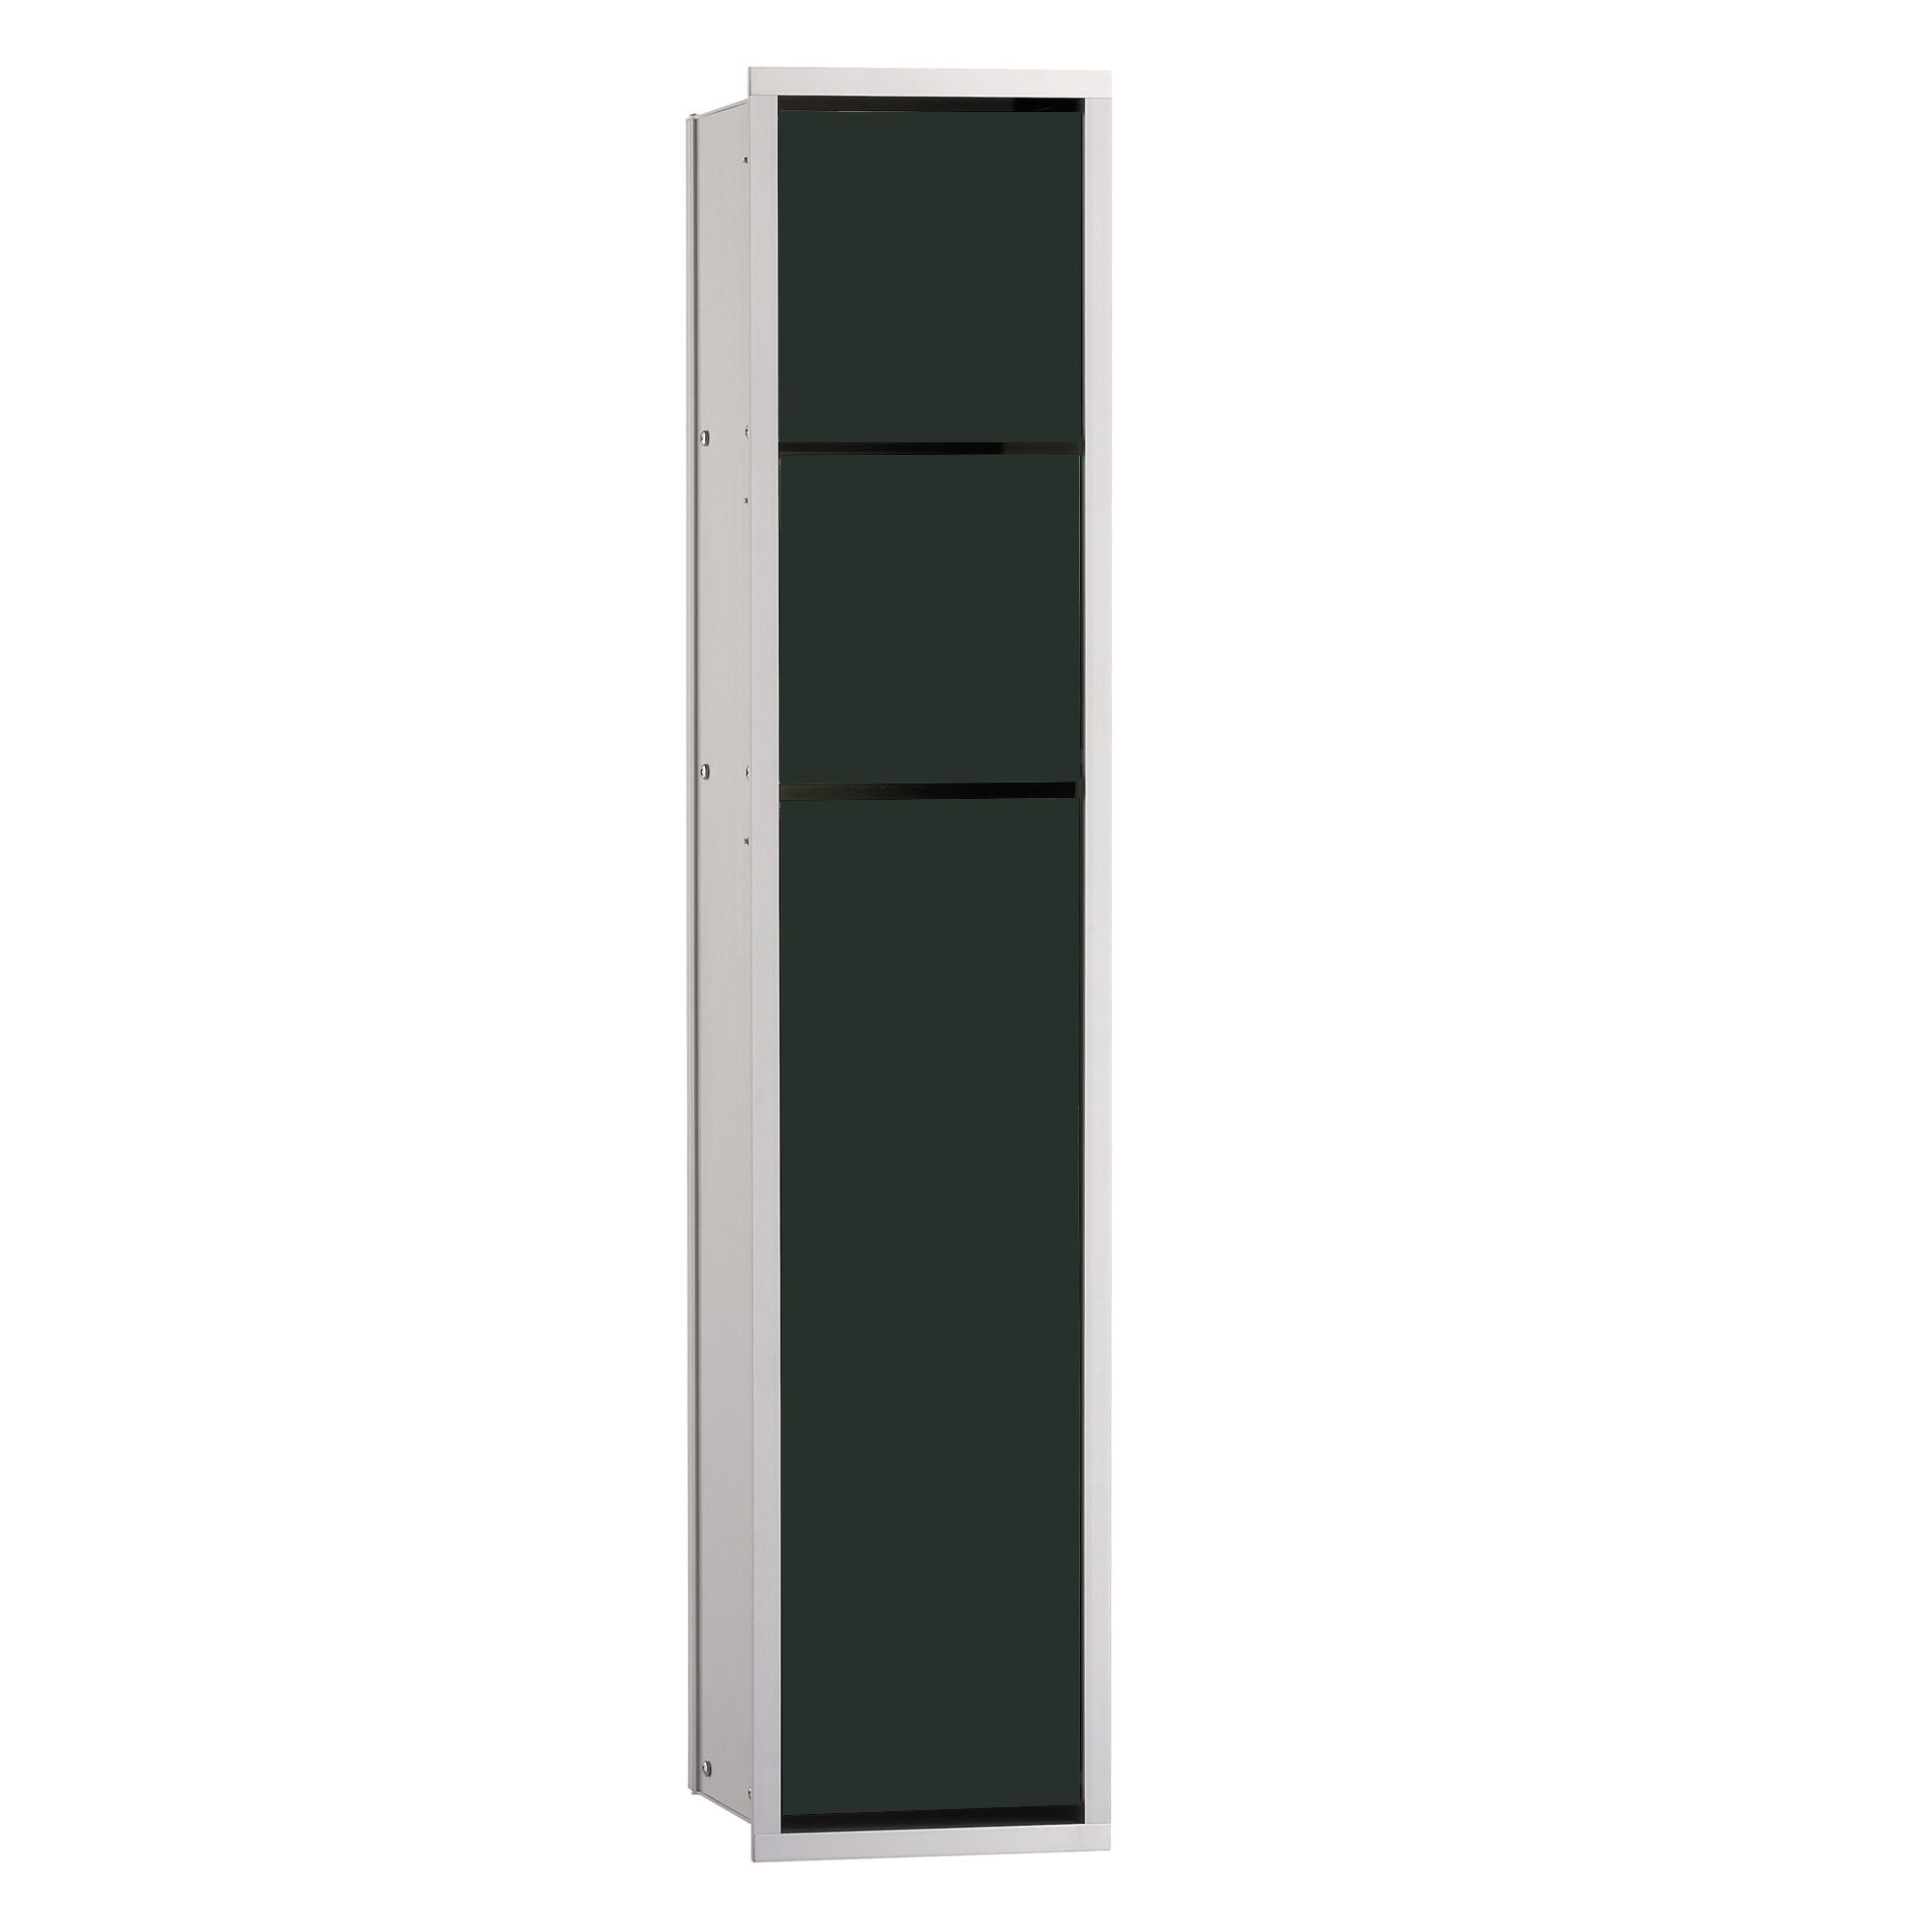 emco asis unterputz wc modul schwarz aluminium 975027550. Black Bedroom Furniture Sets. Home Design Ideas